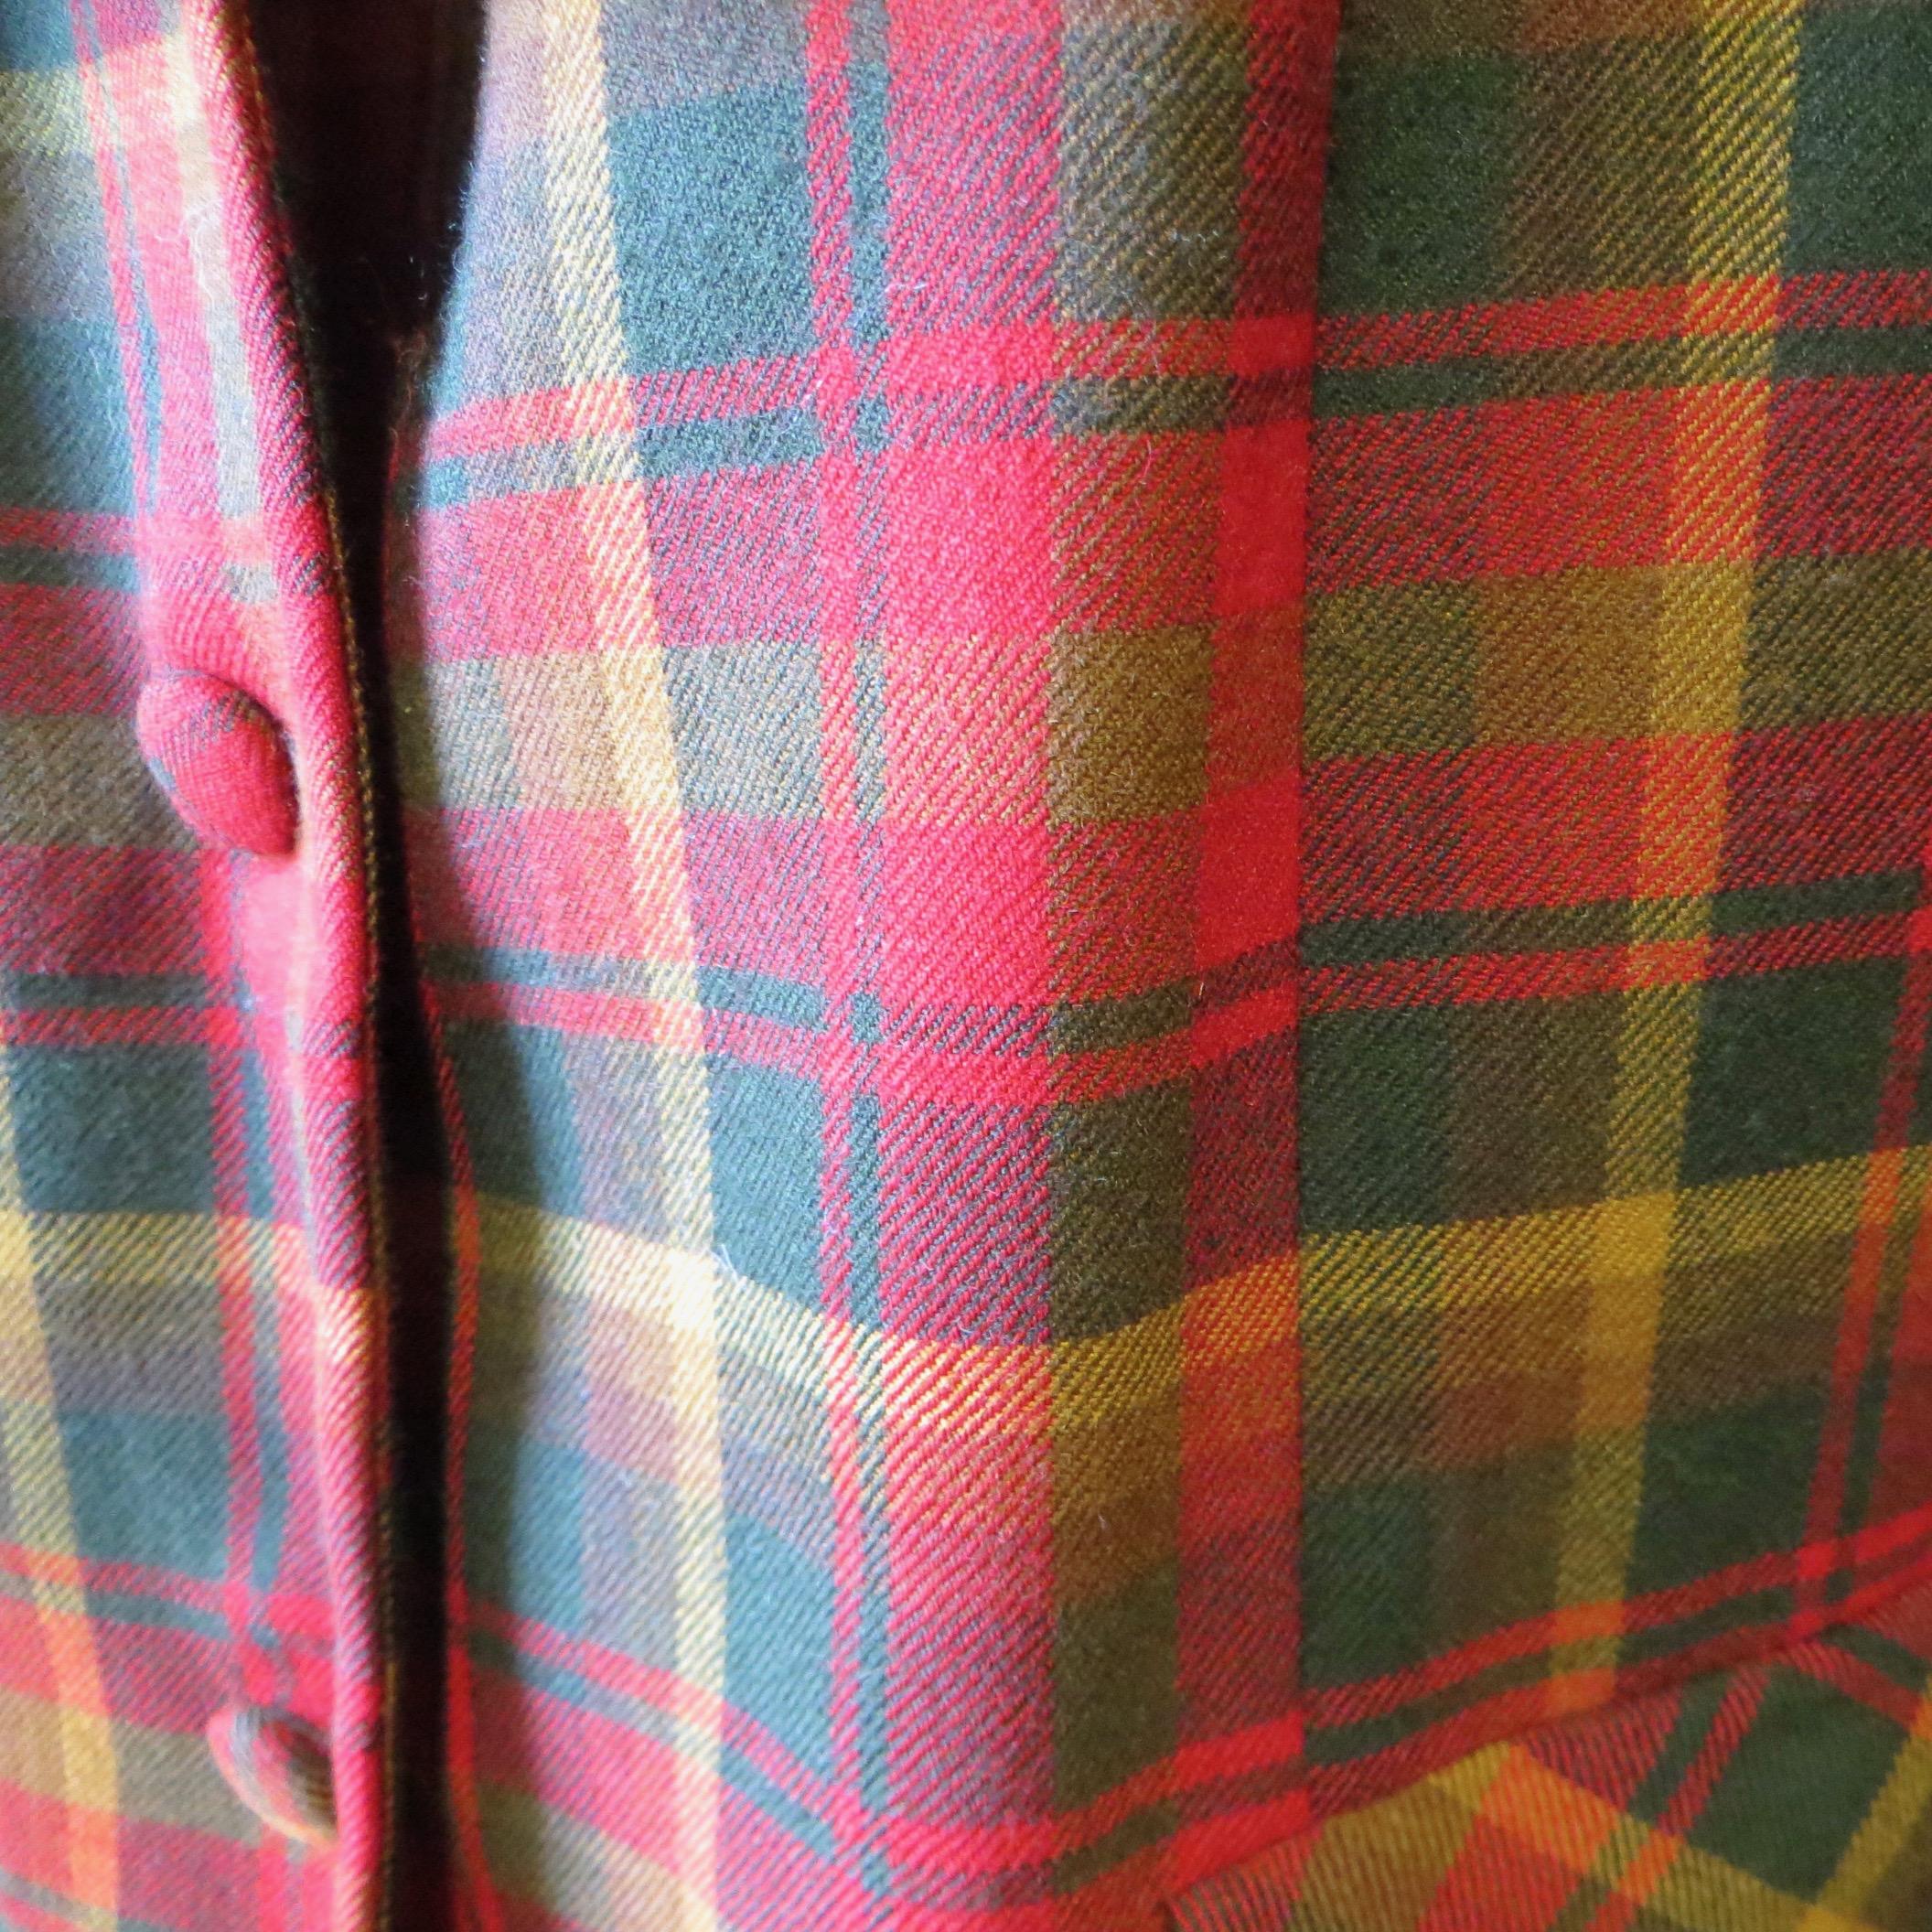 Highland Queen 1950s Plaid Suit